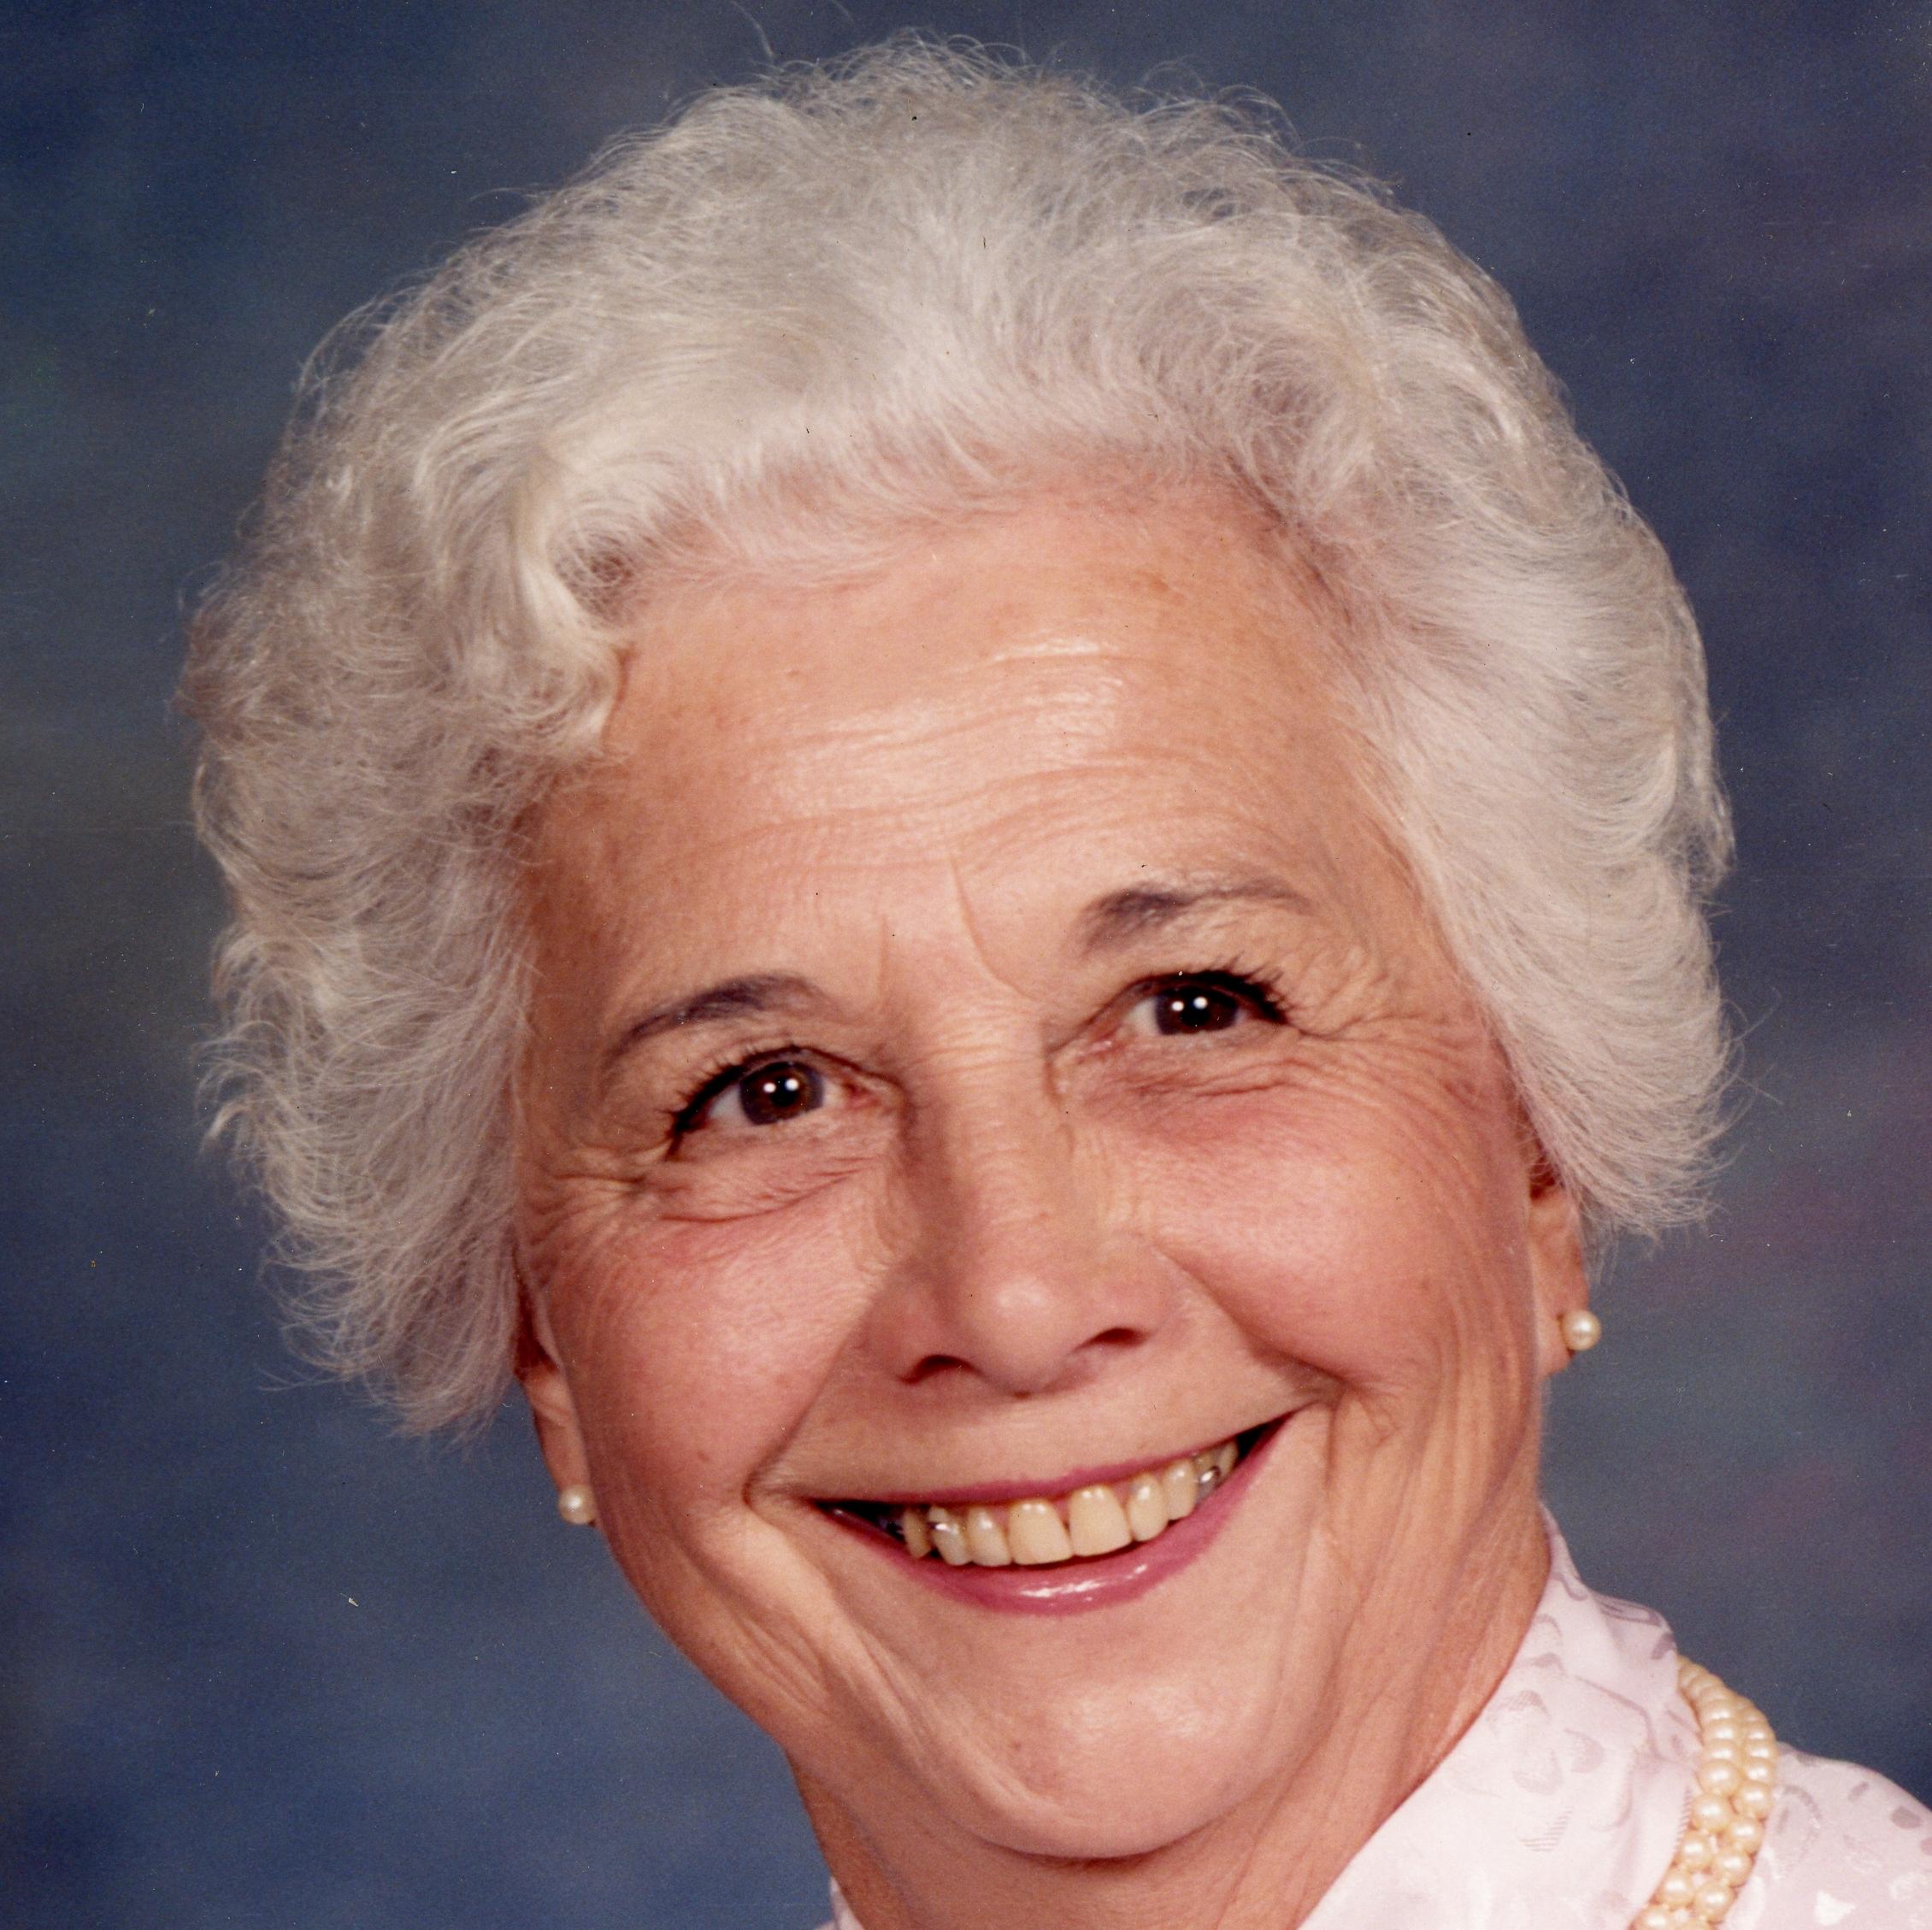 Evelyn L. (Redden) Metzler of Dunstable